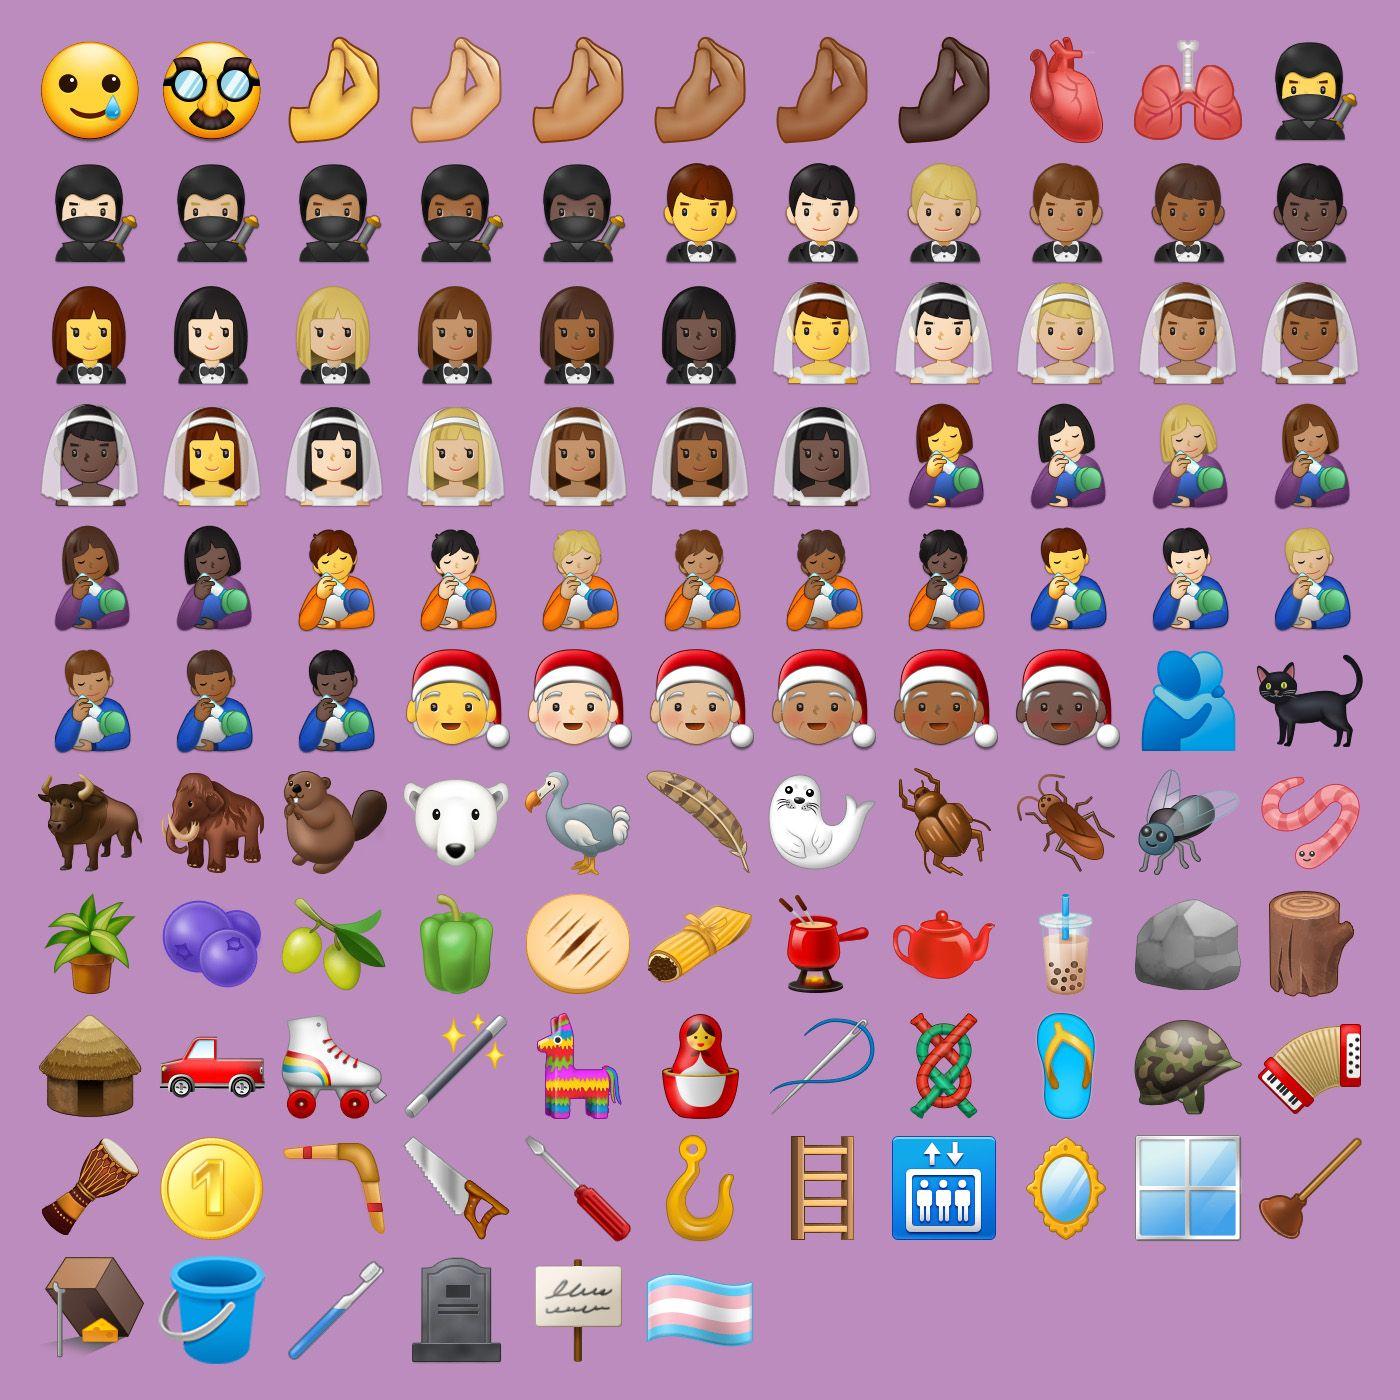 Emojipedia-Samsung-One-UI-2_5-All-New-Emojis